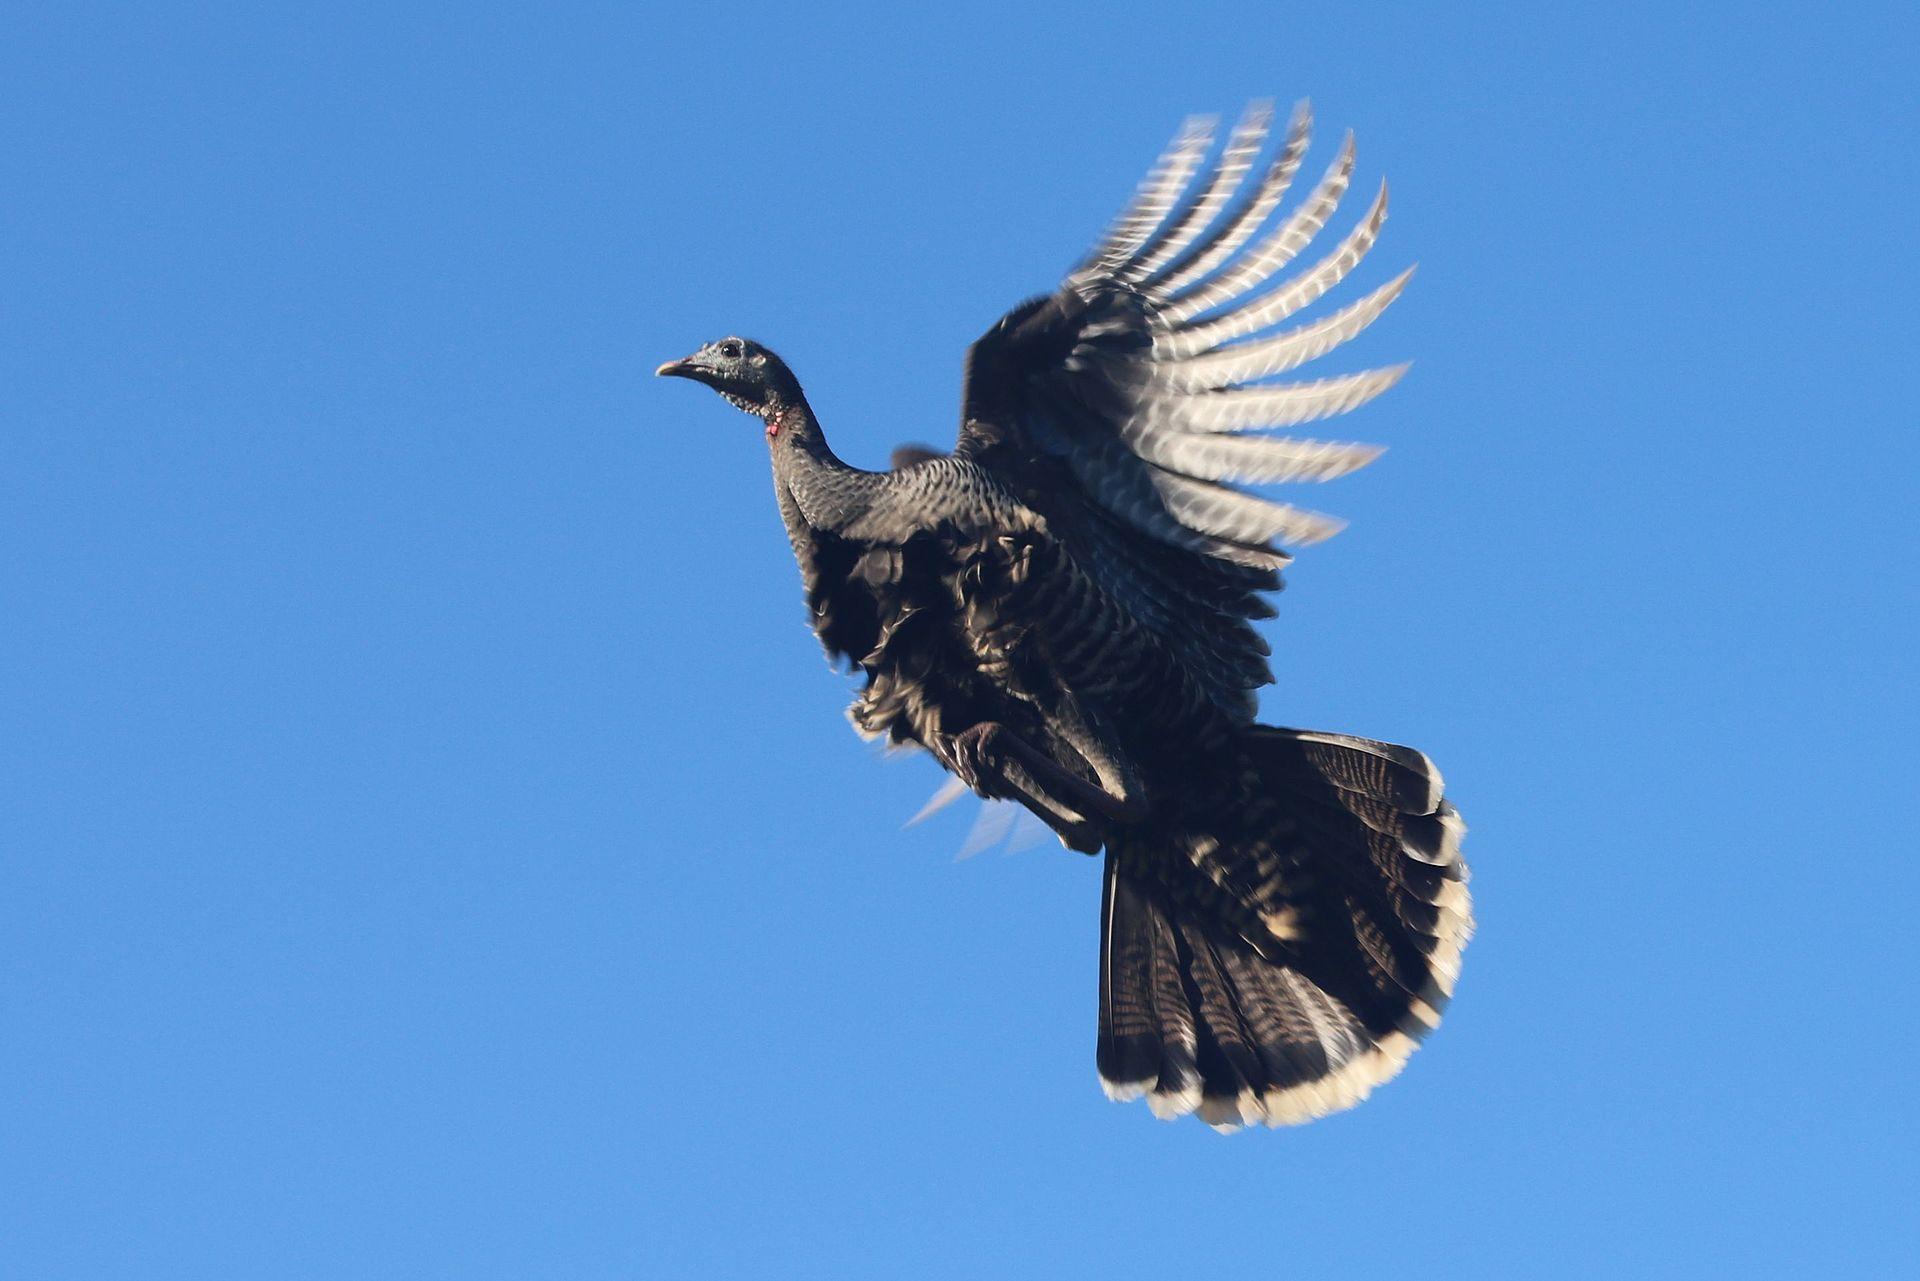 Meleagris_gallopavo_in_flight.gk